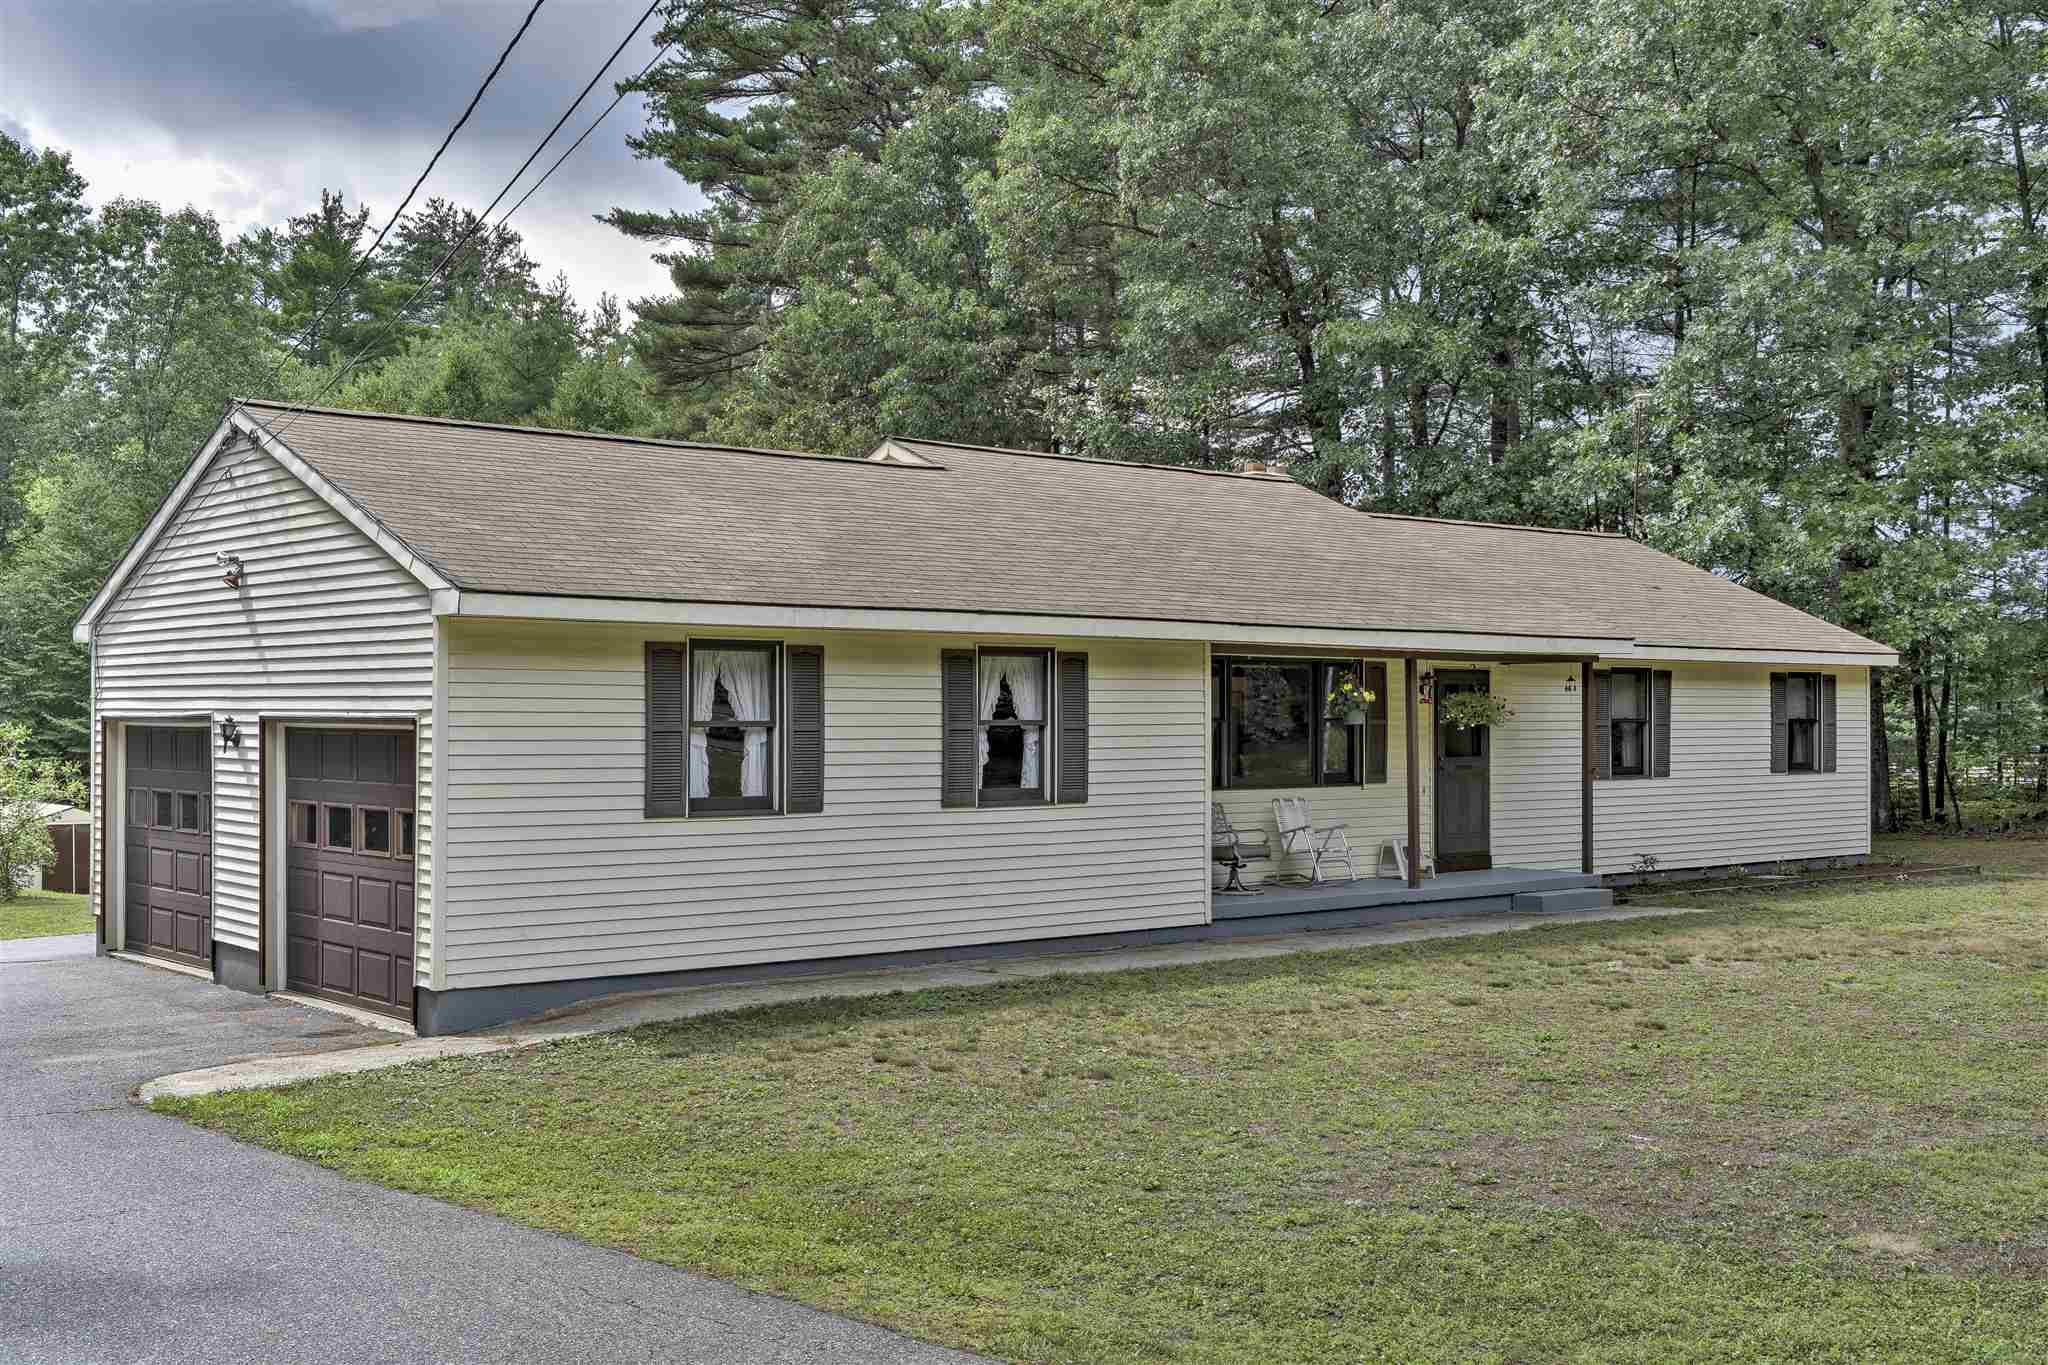 83 Plain Road, Hinsdale, NH | Monadnock Region Residential ...